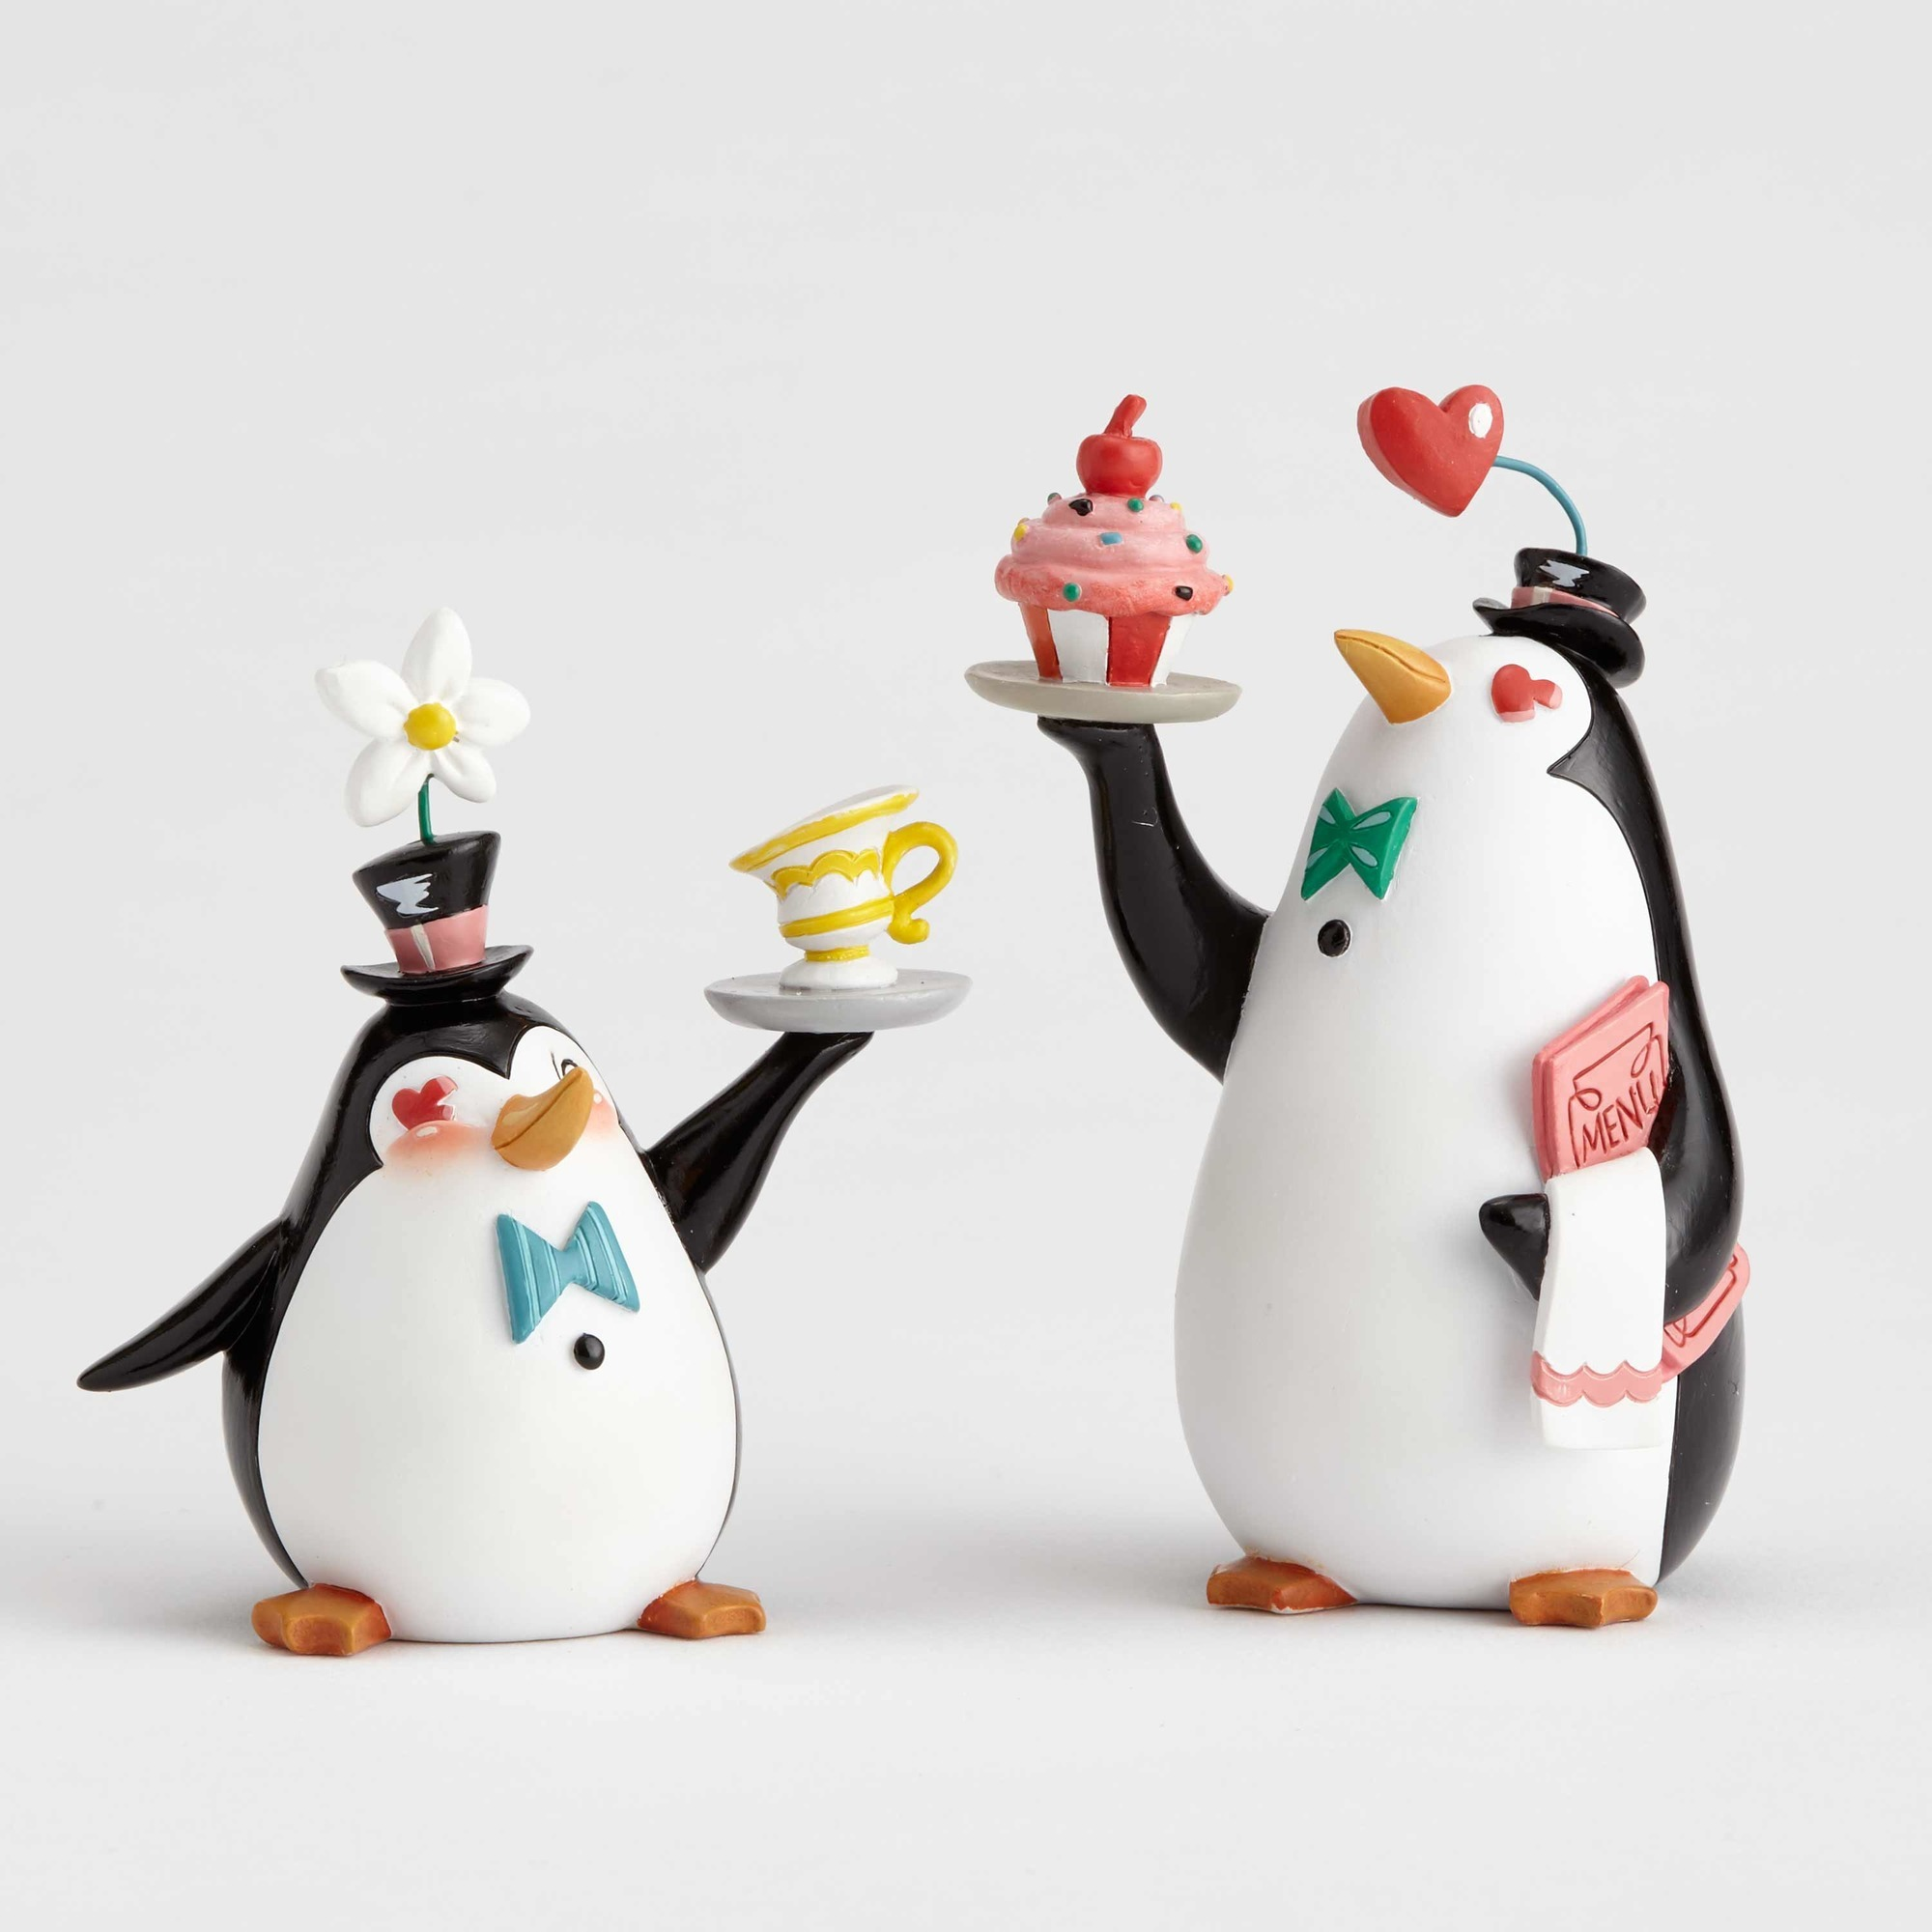 World of Miss Mindy 6001672N Penguin Waiters